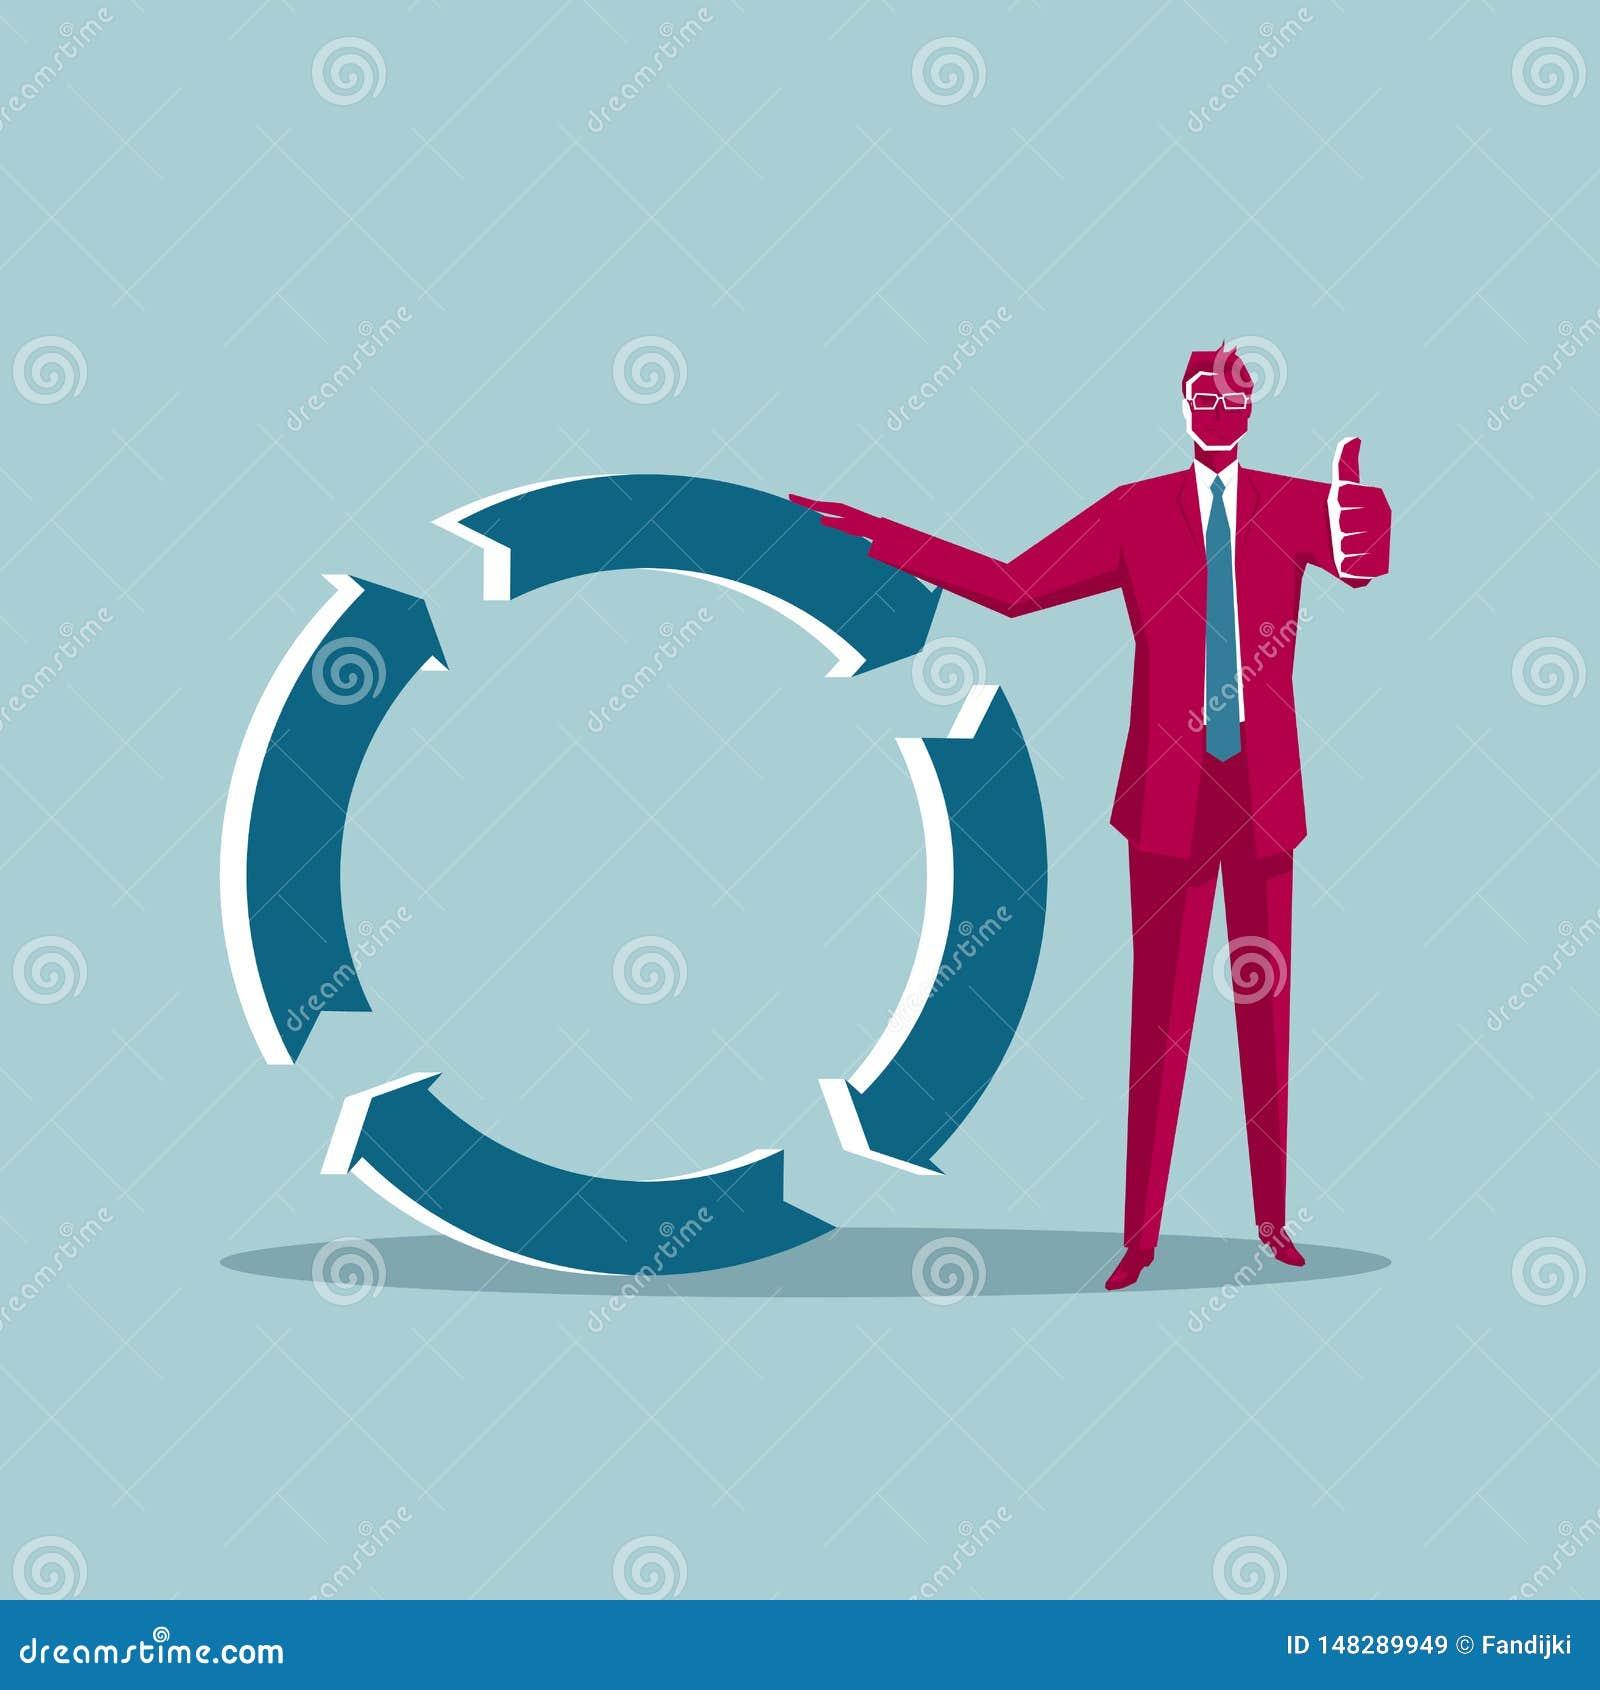 Businessman relies on the arrow symbol.